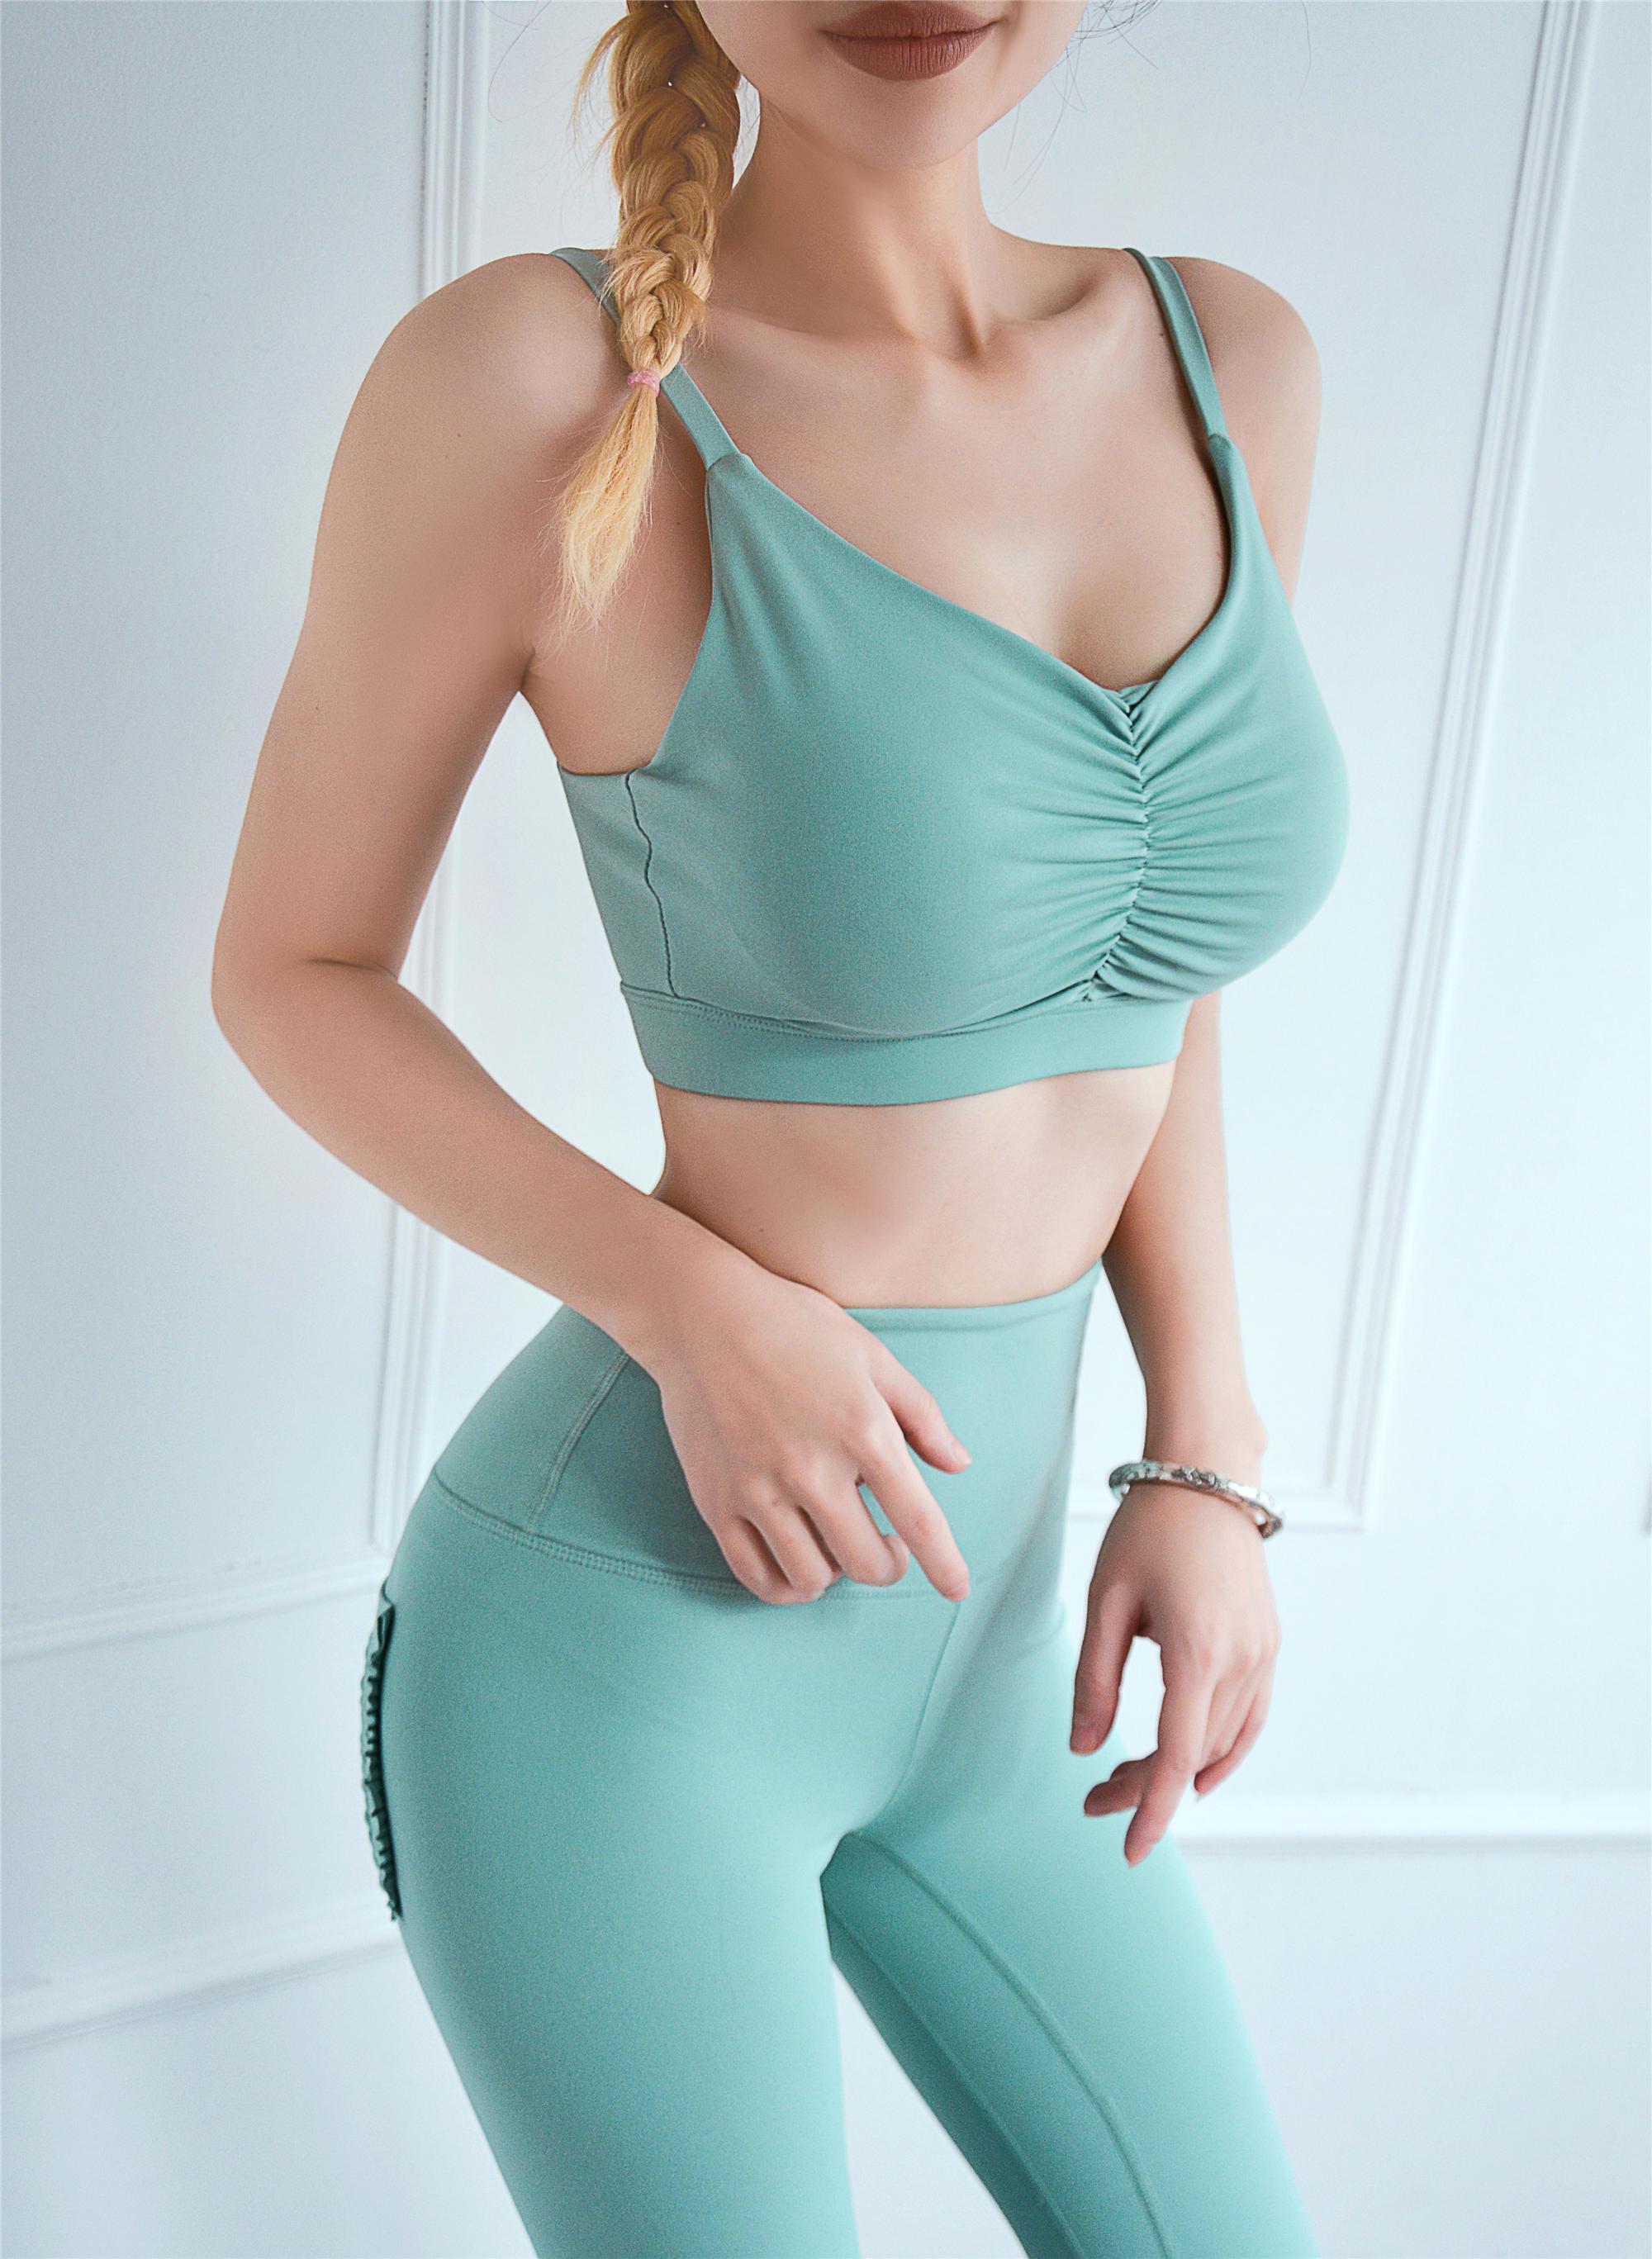 Latest Women Yoga Top Drapery Sportswear Quick-dry Running Sports Bra